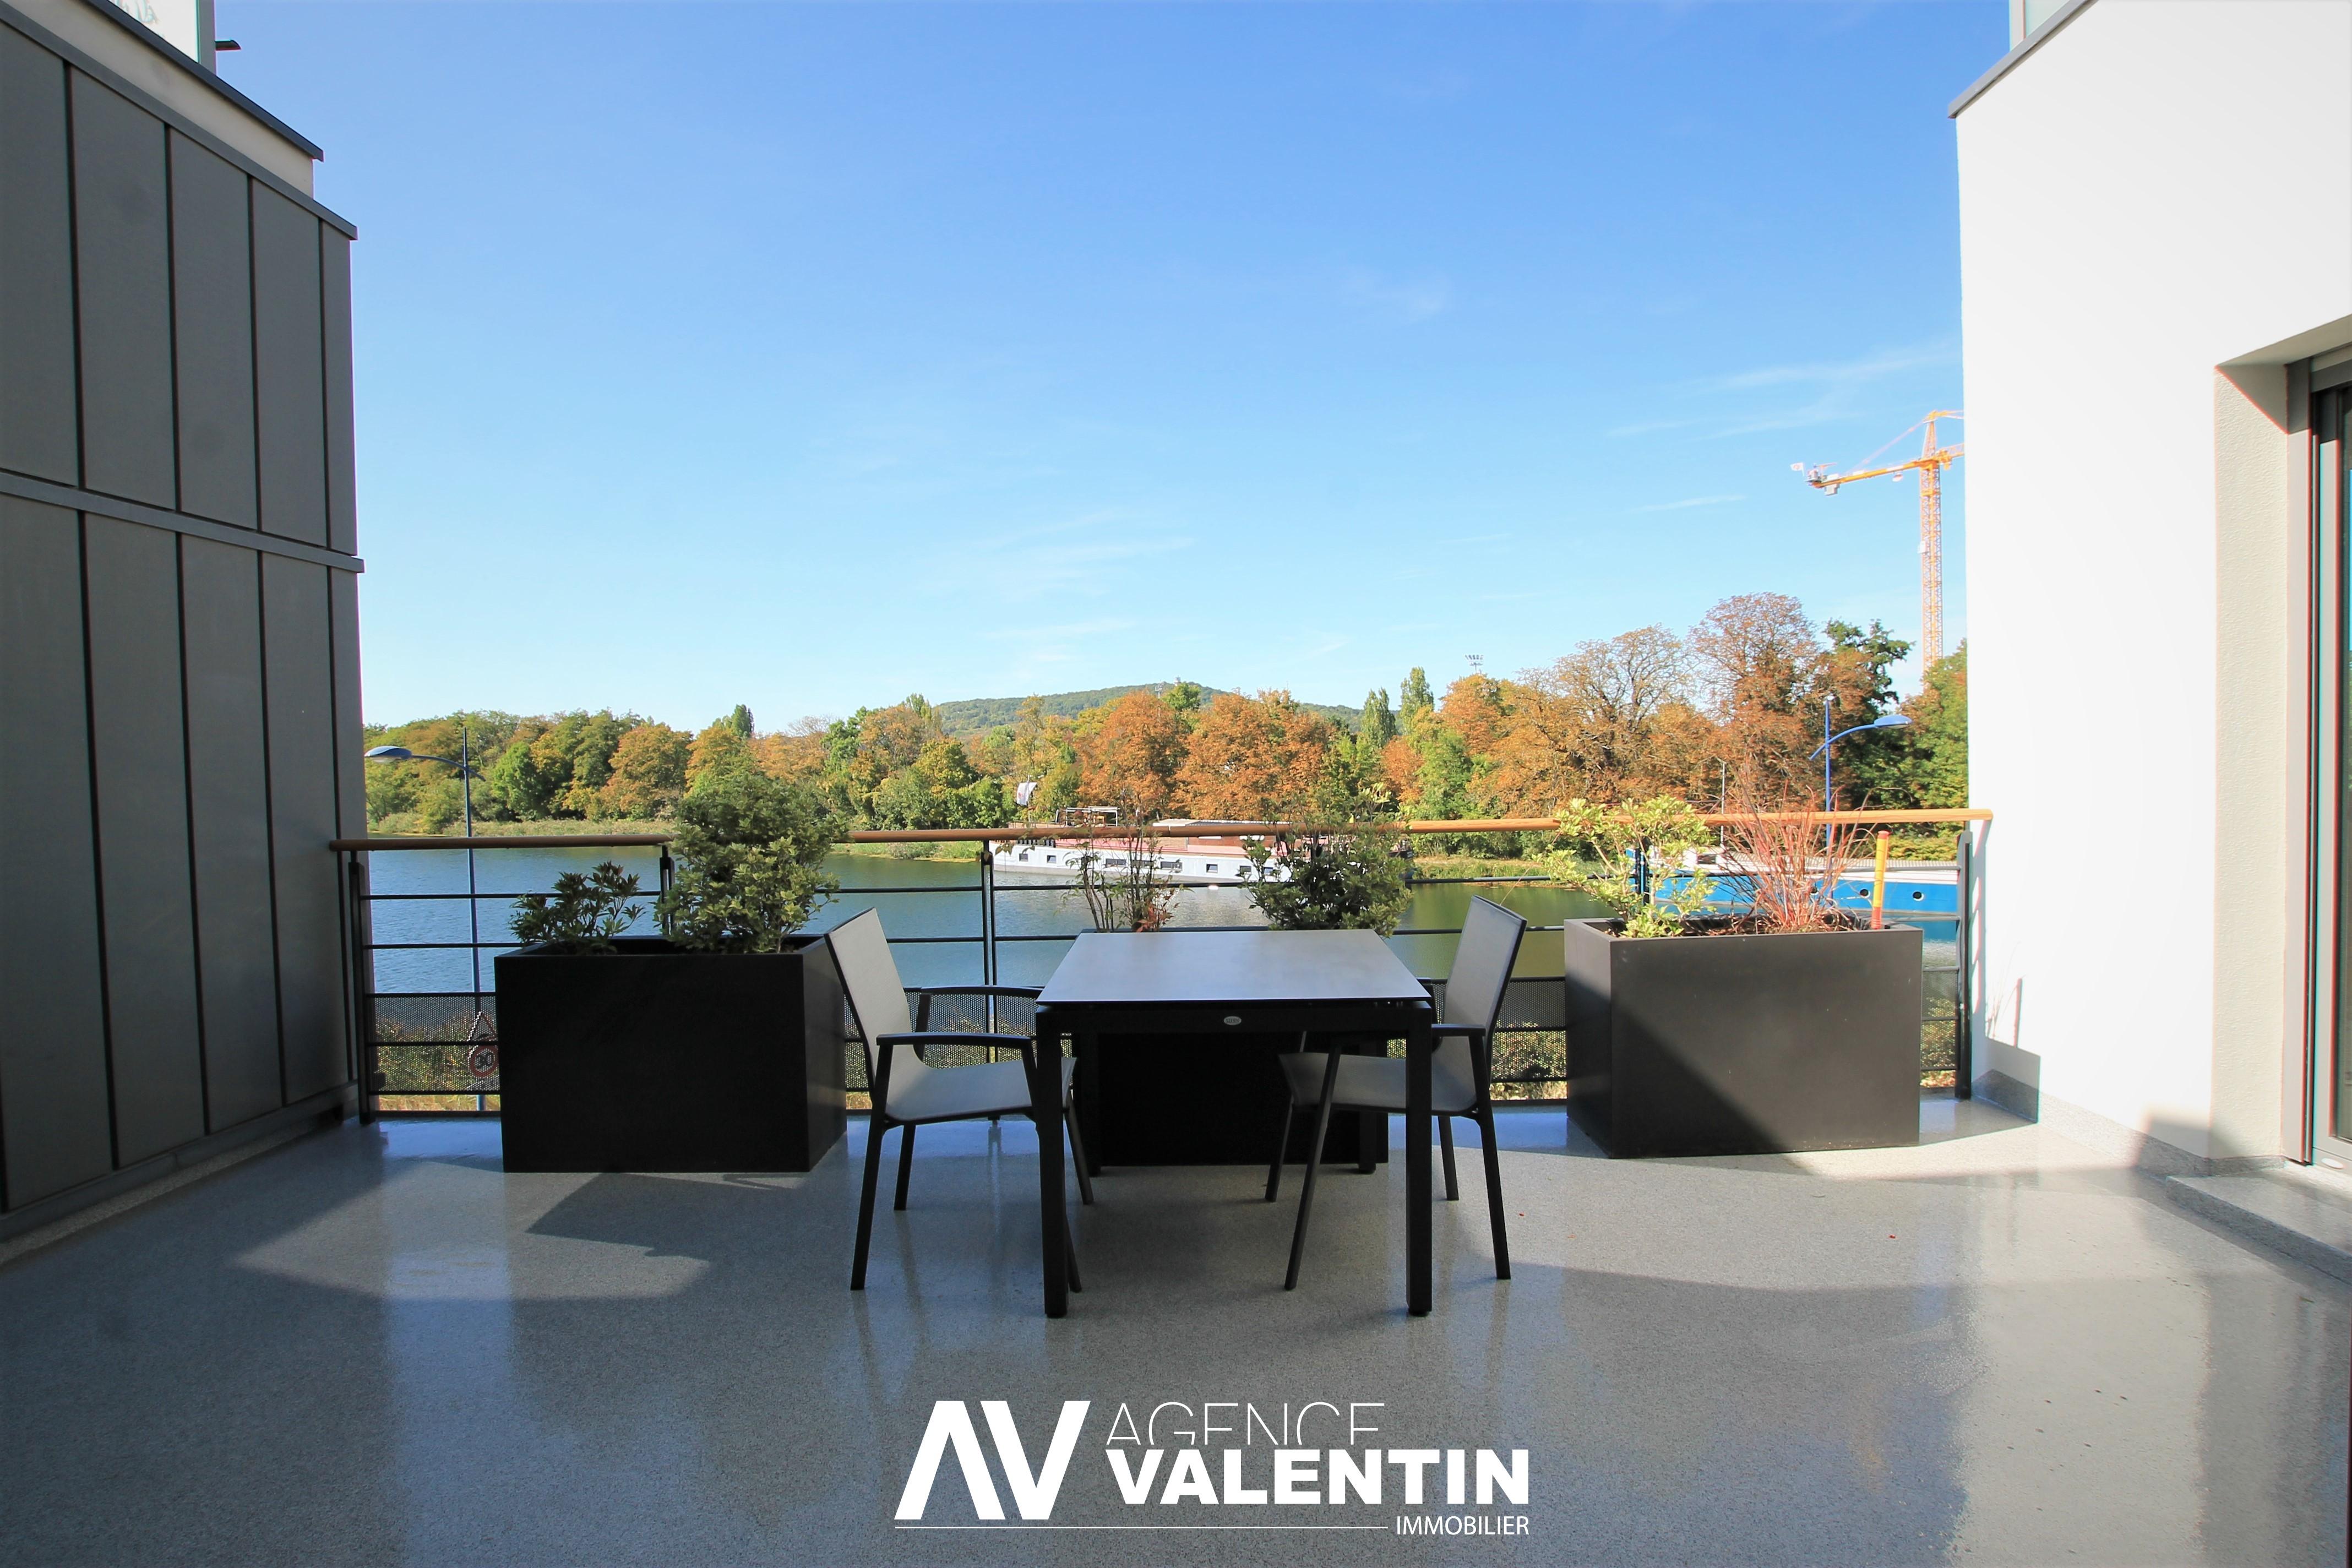 Agence Valentin, Agence immobilière Metz